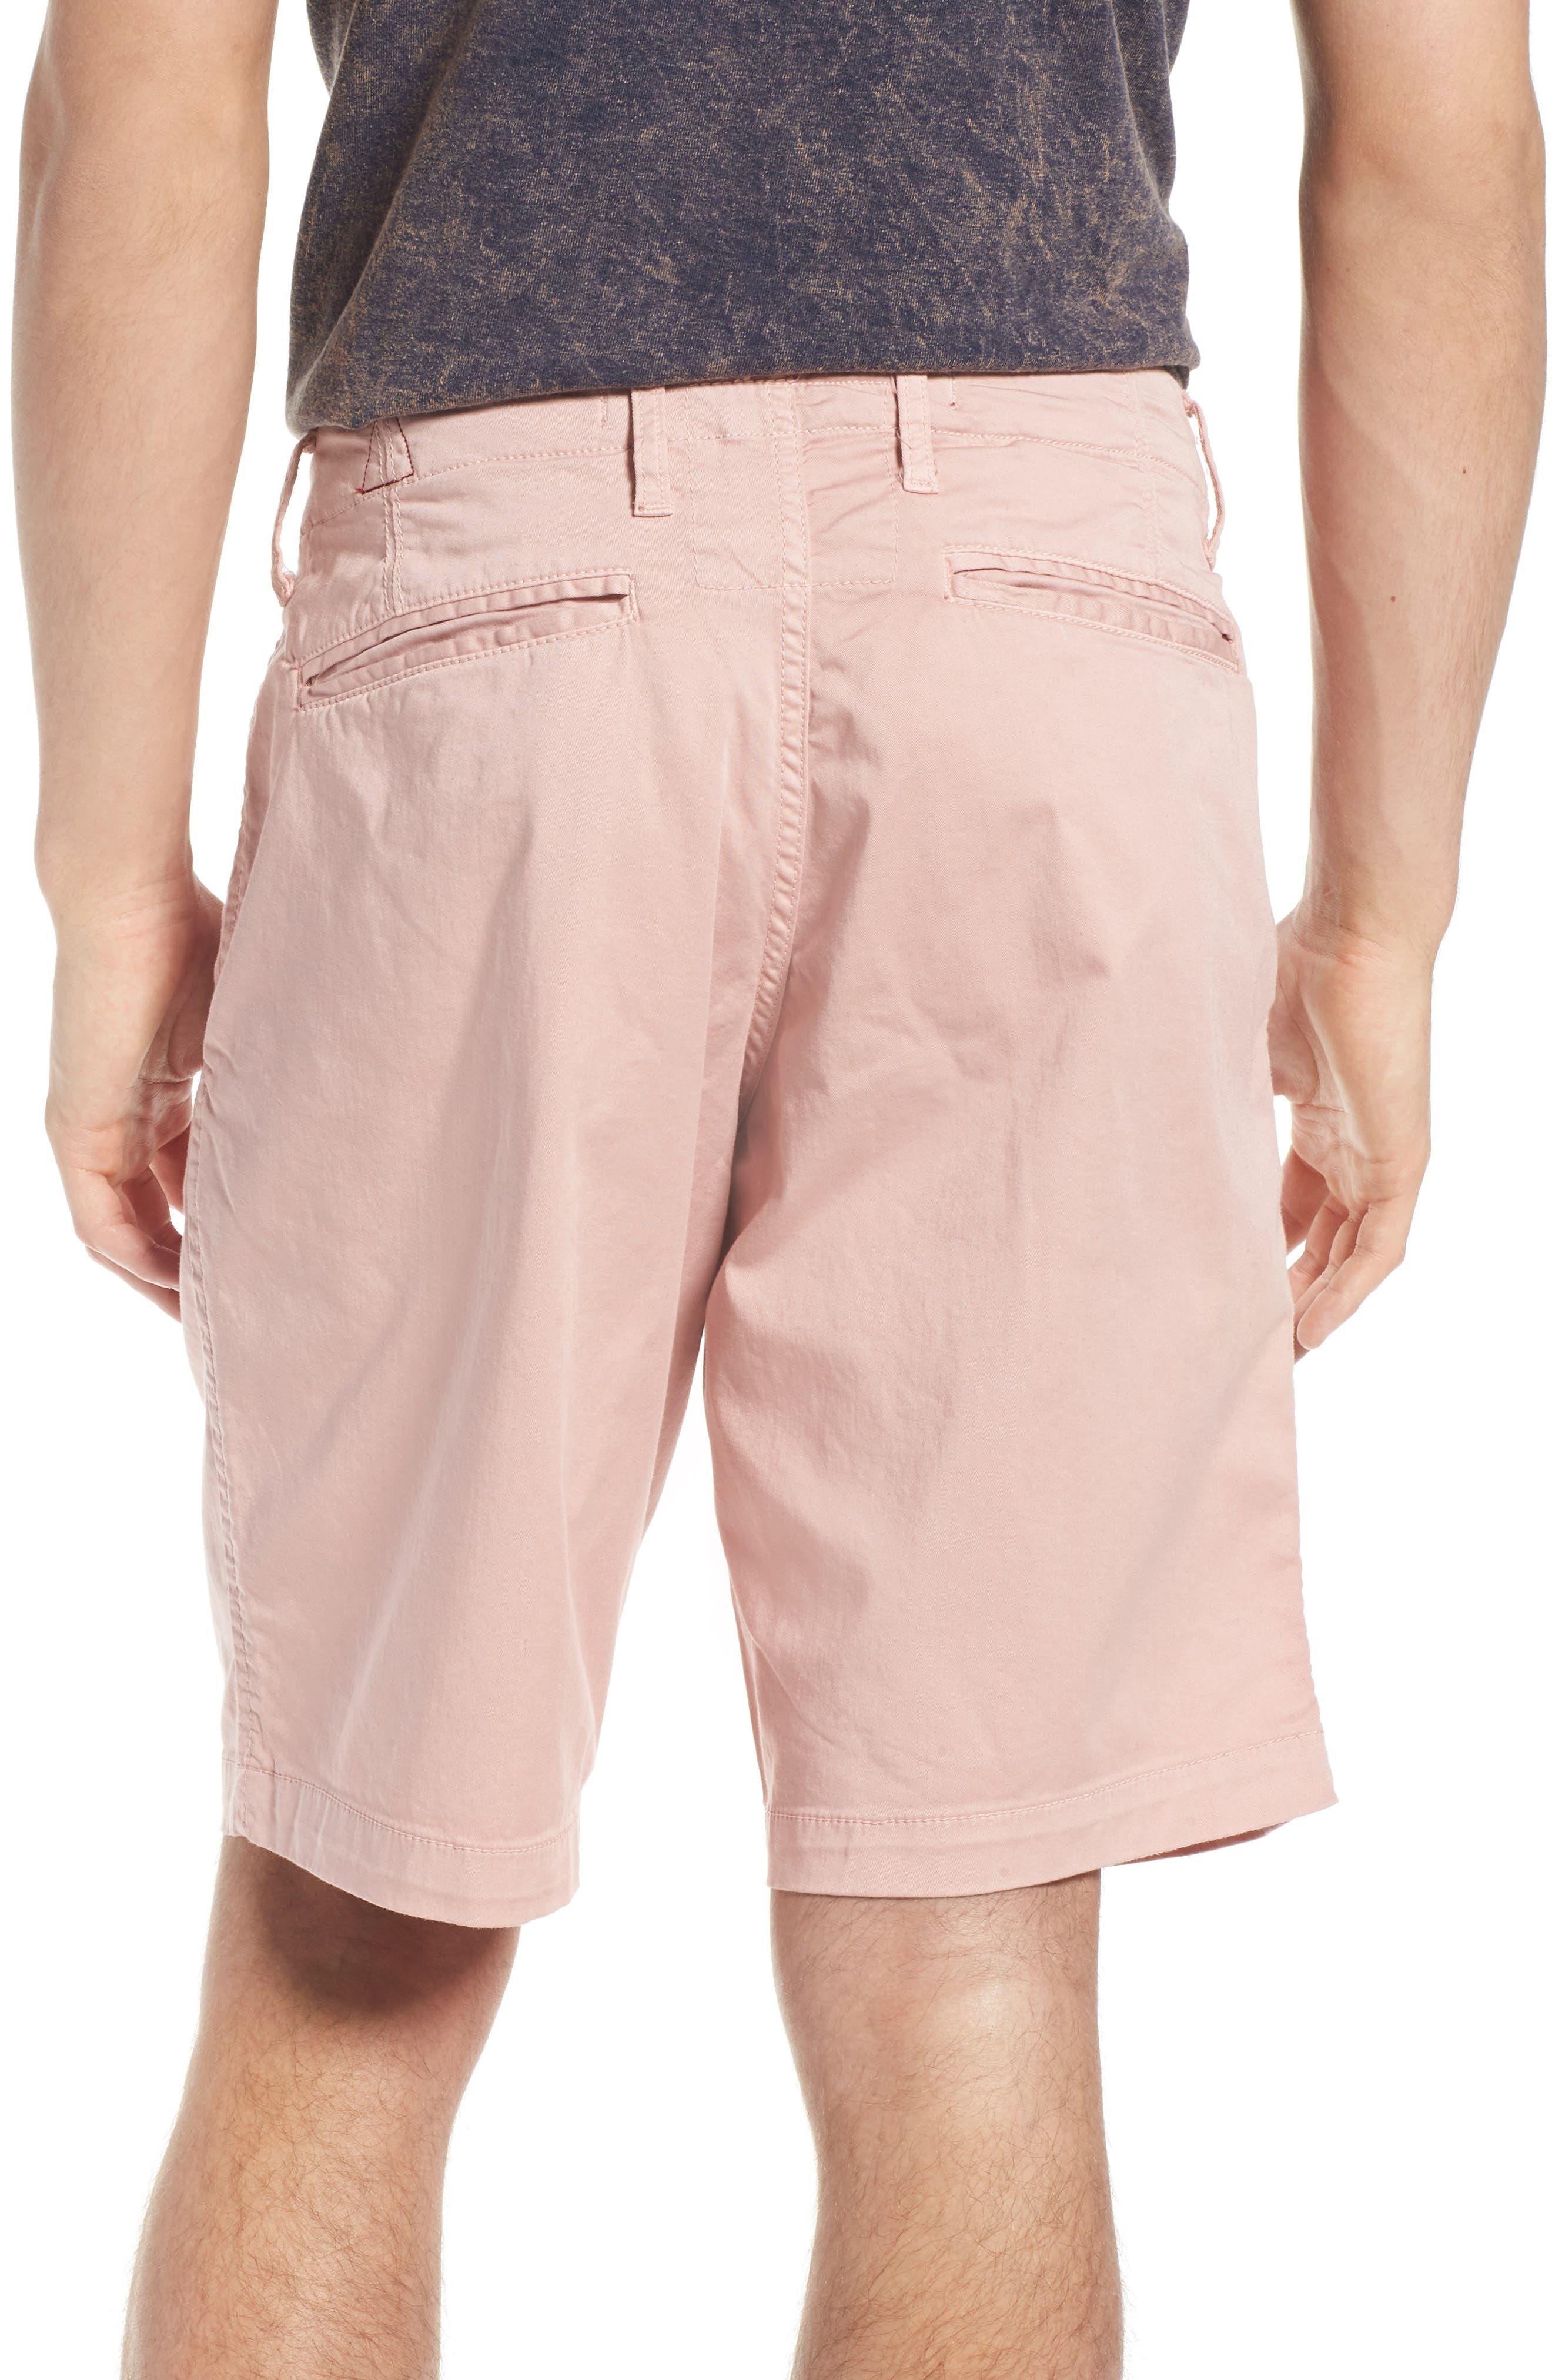 St. Barts Twill Shorts,                             Alternate thumbnail 23, color,